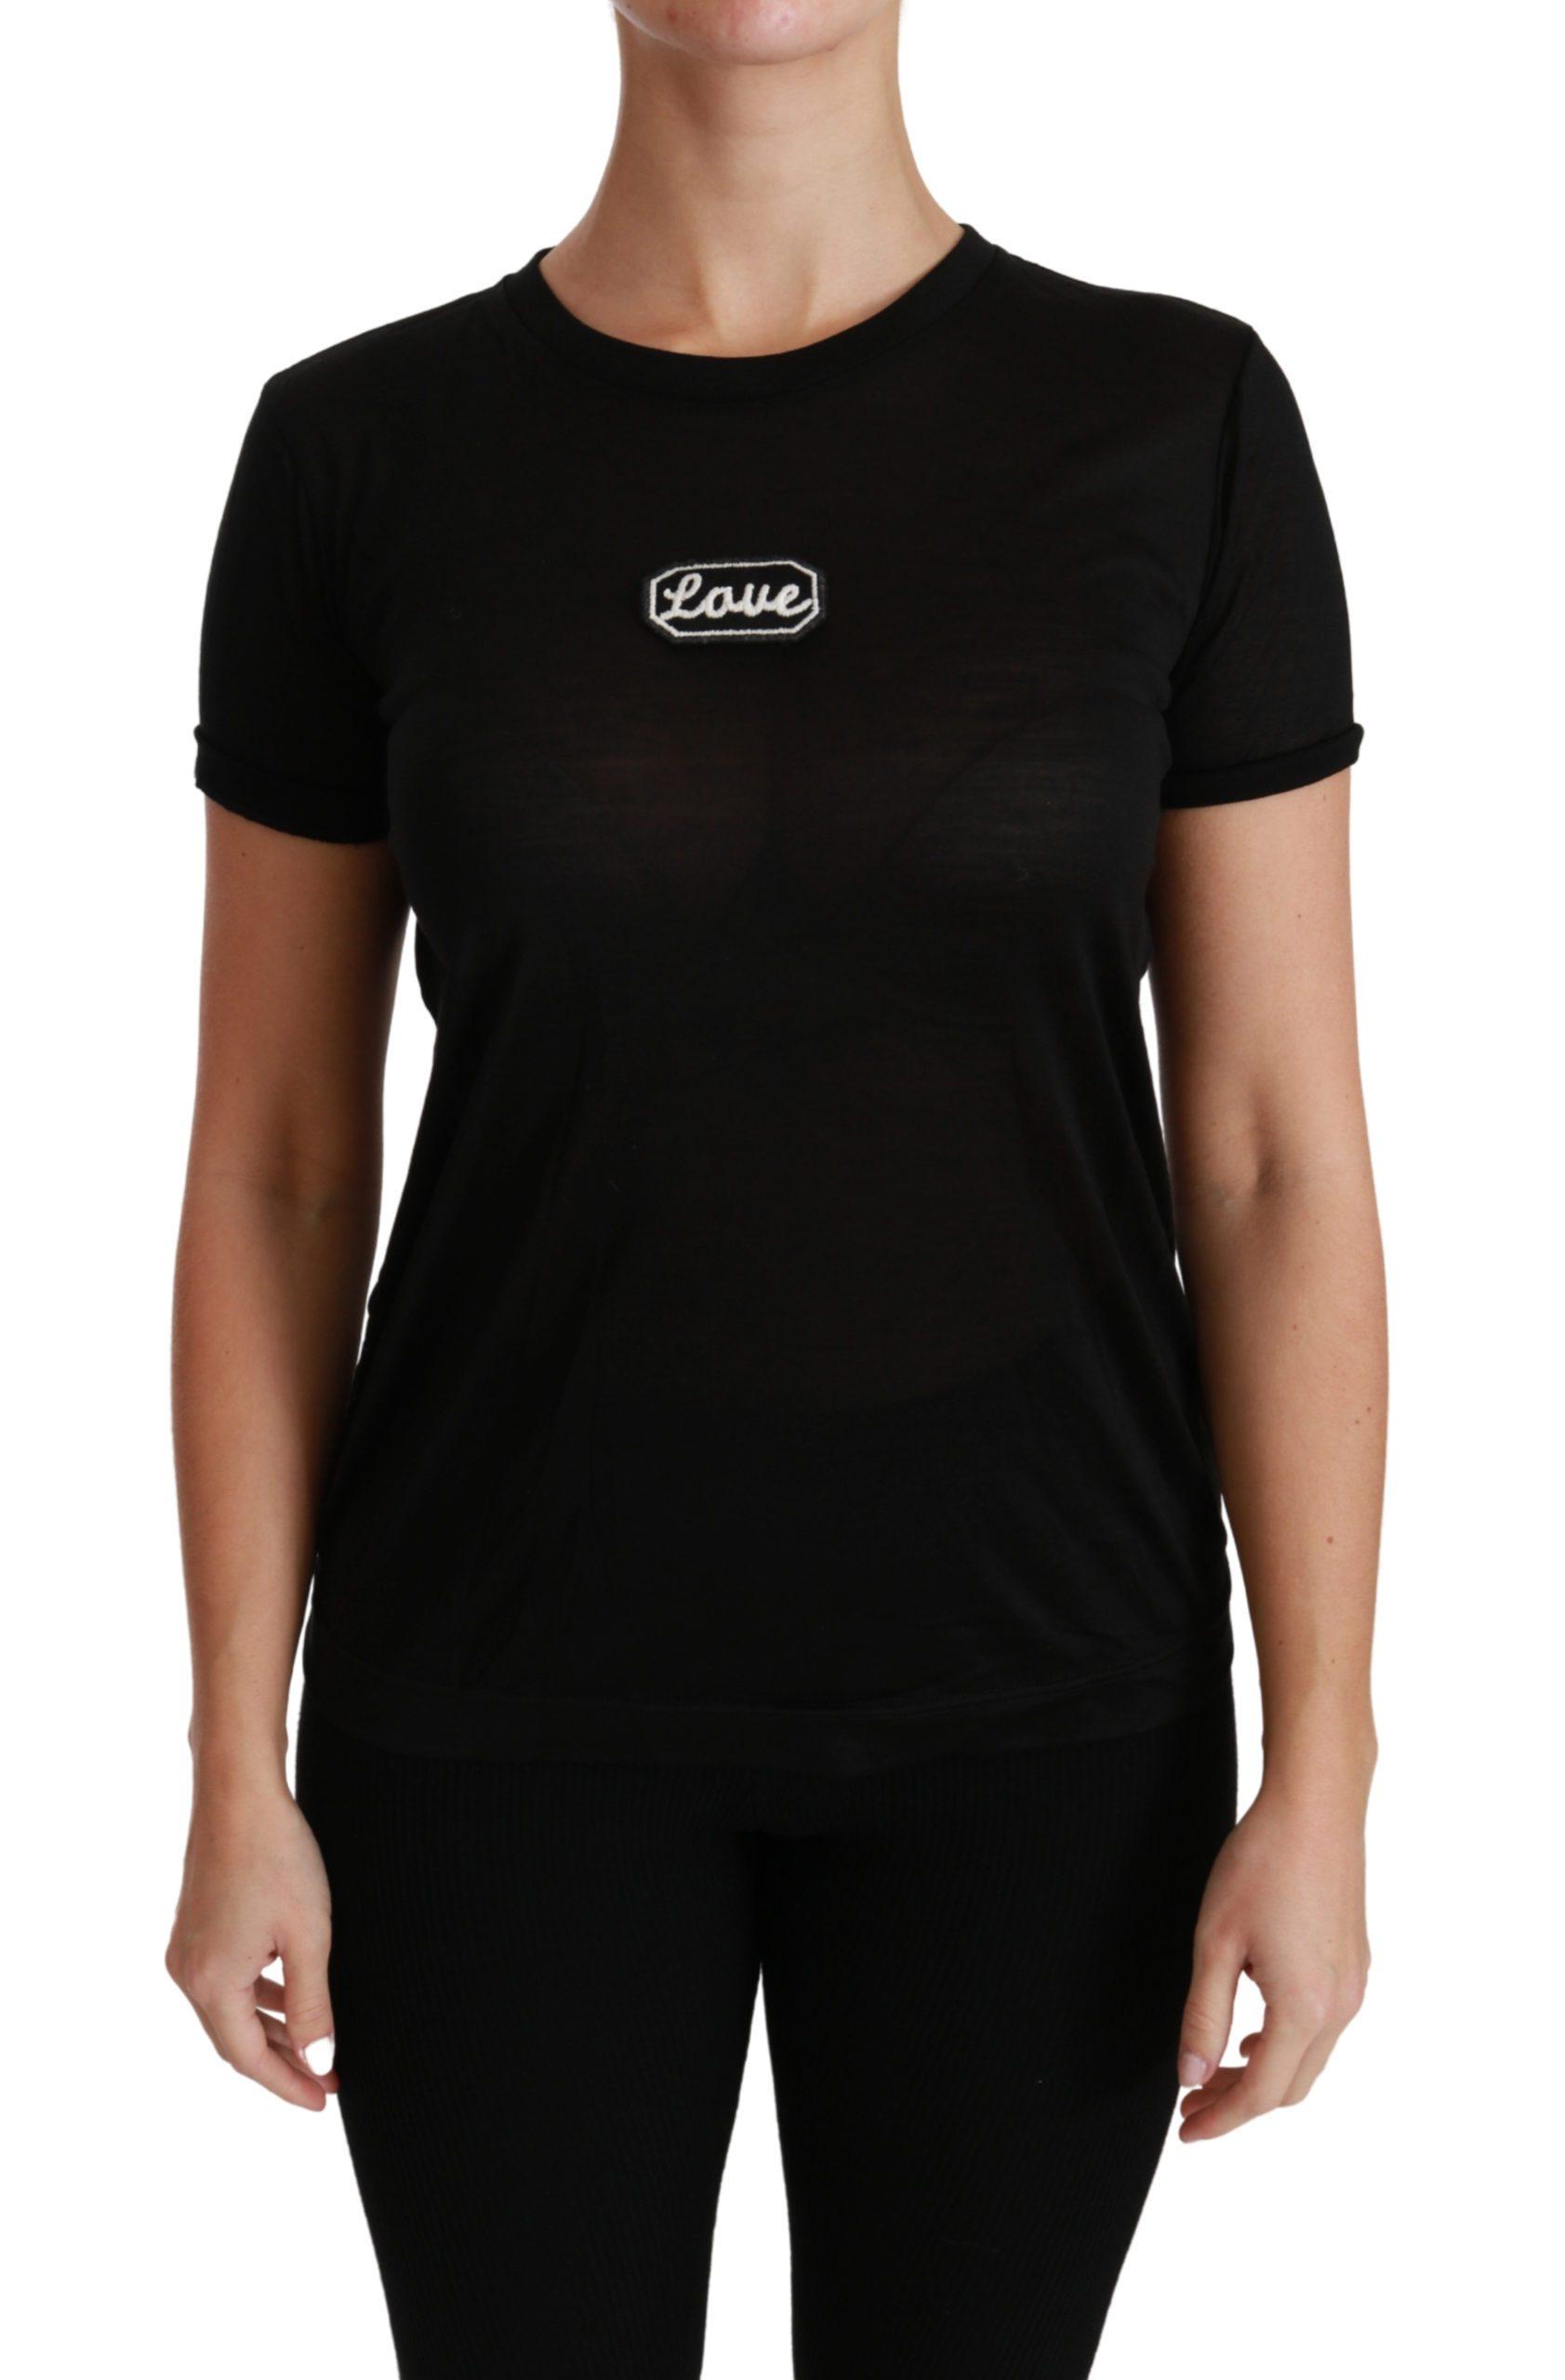 Black Love Short Sleeve Top Silk T-shirt - IT46|XL